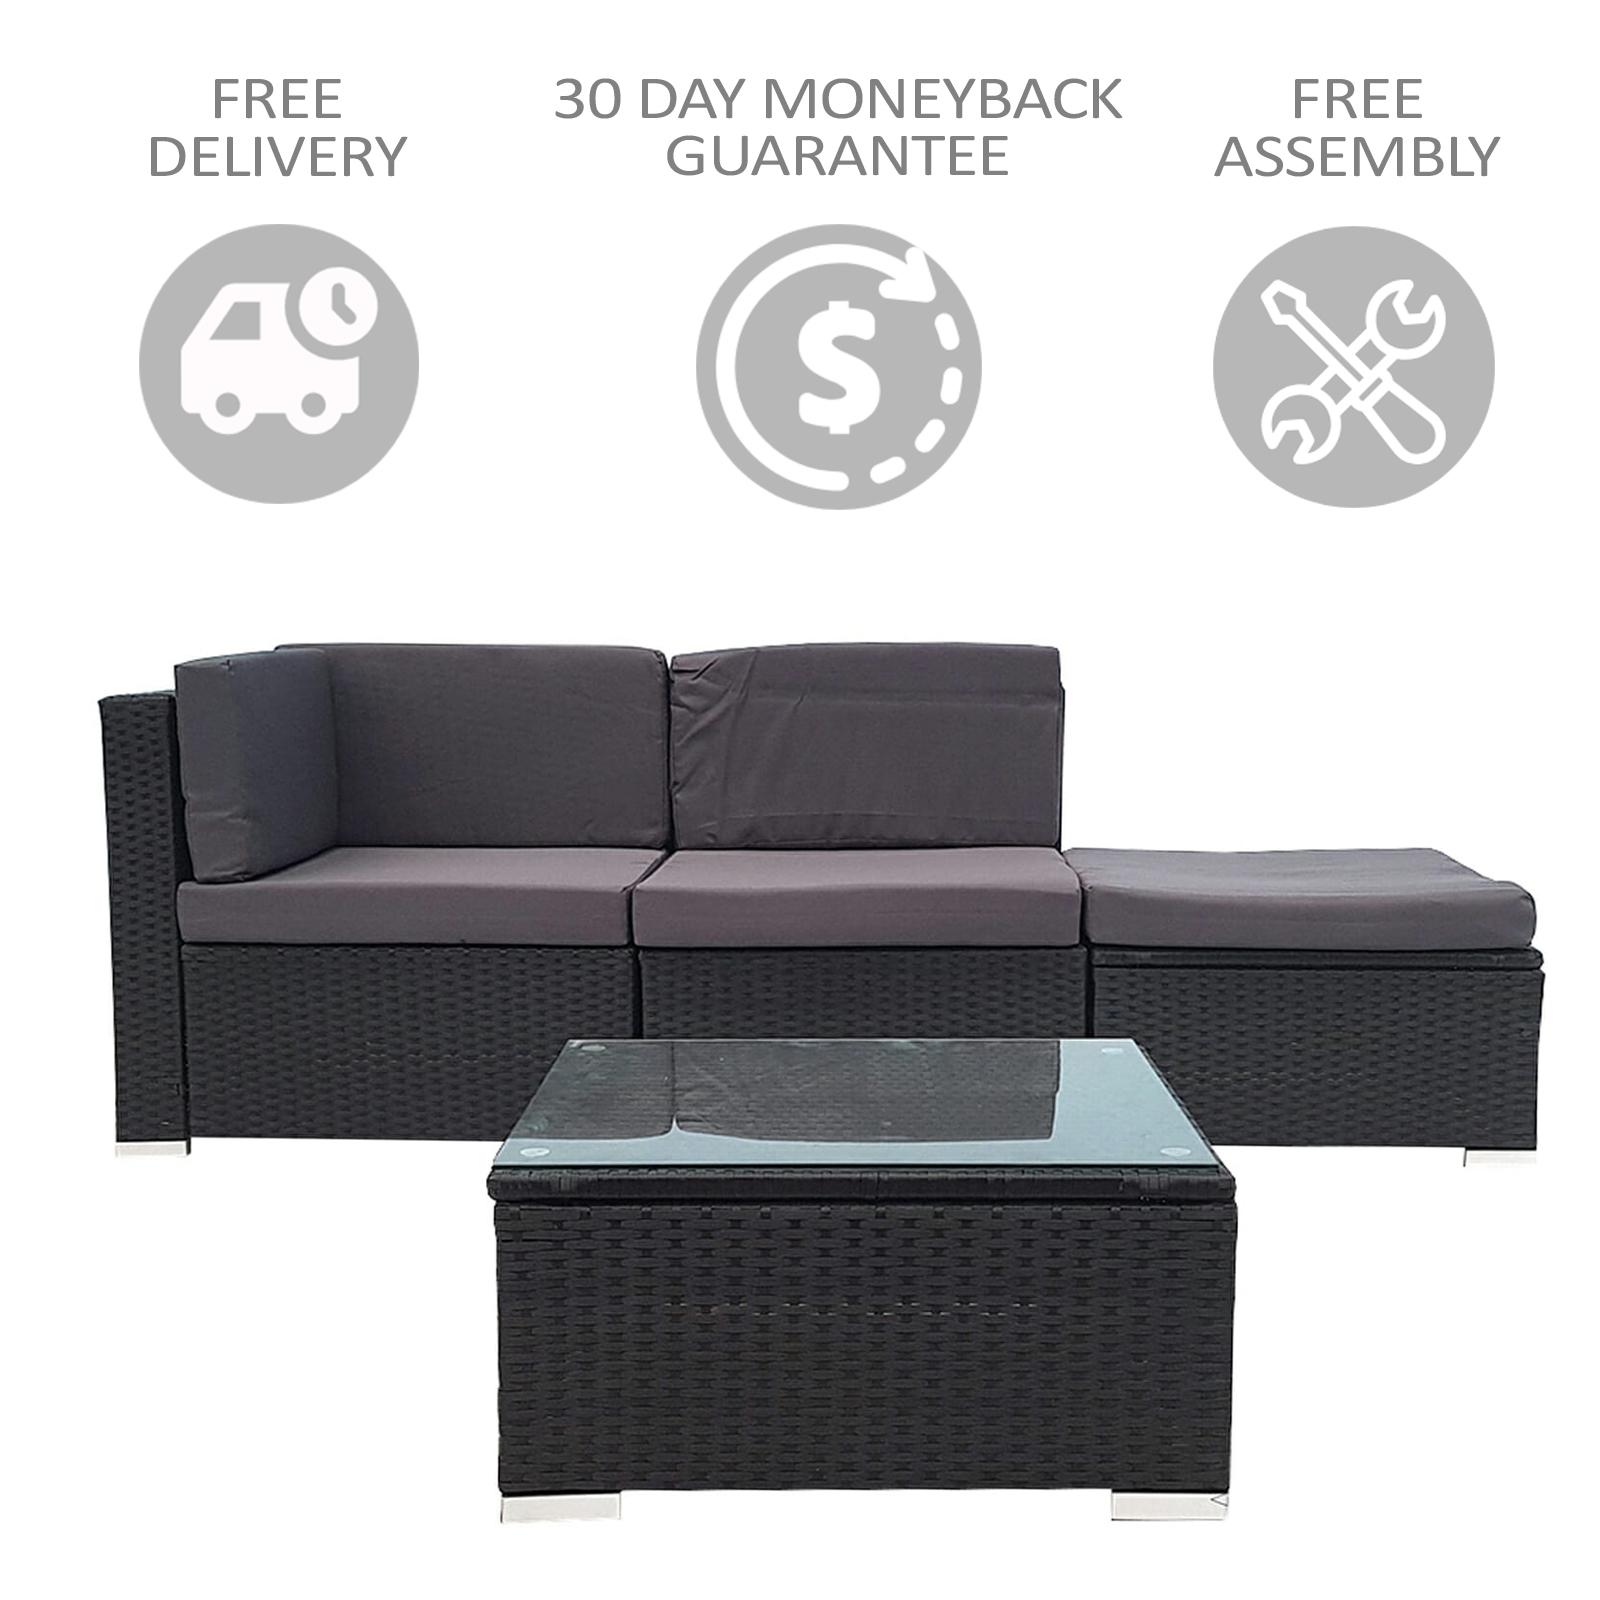 Tremendous 4 Piece Wicker Outdoor Pe Rattan Furniture Sofa Set Home Interior And Landscaping Ologienasavecom